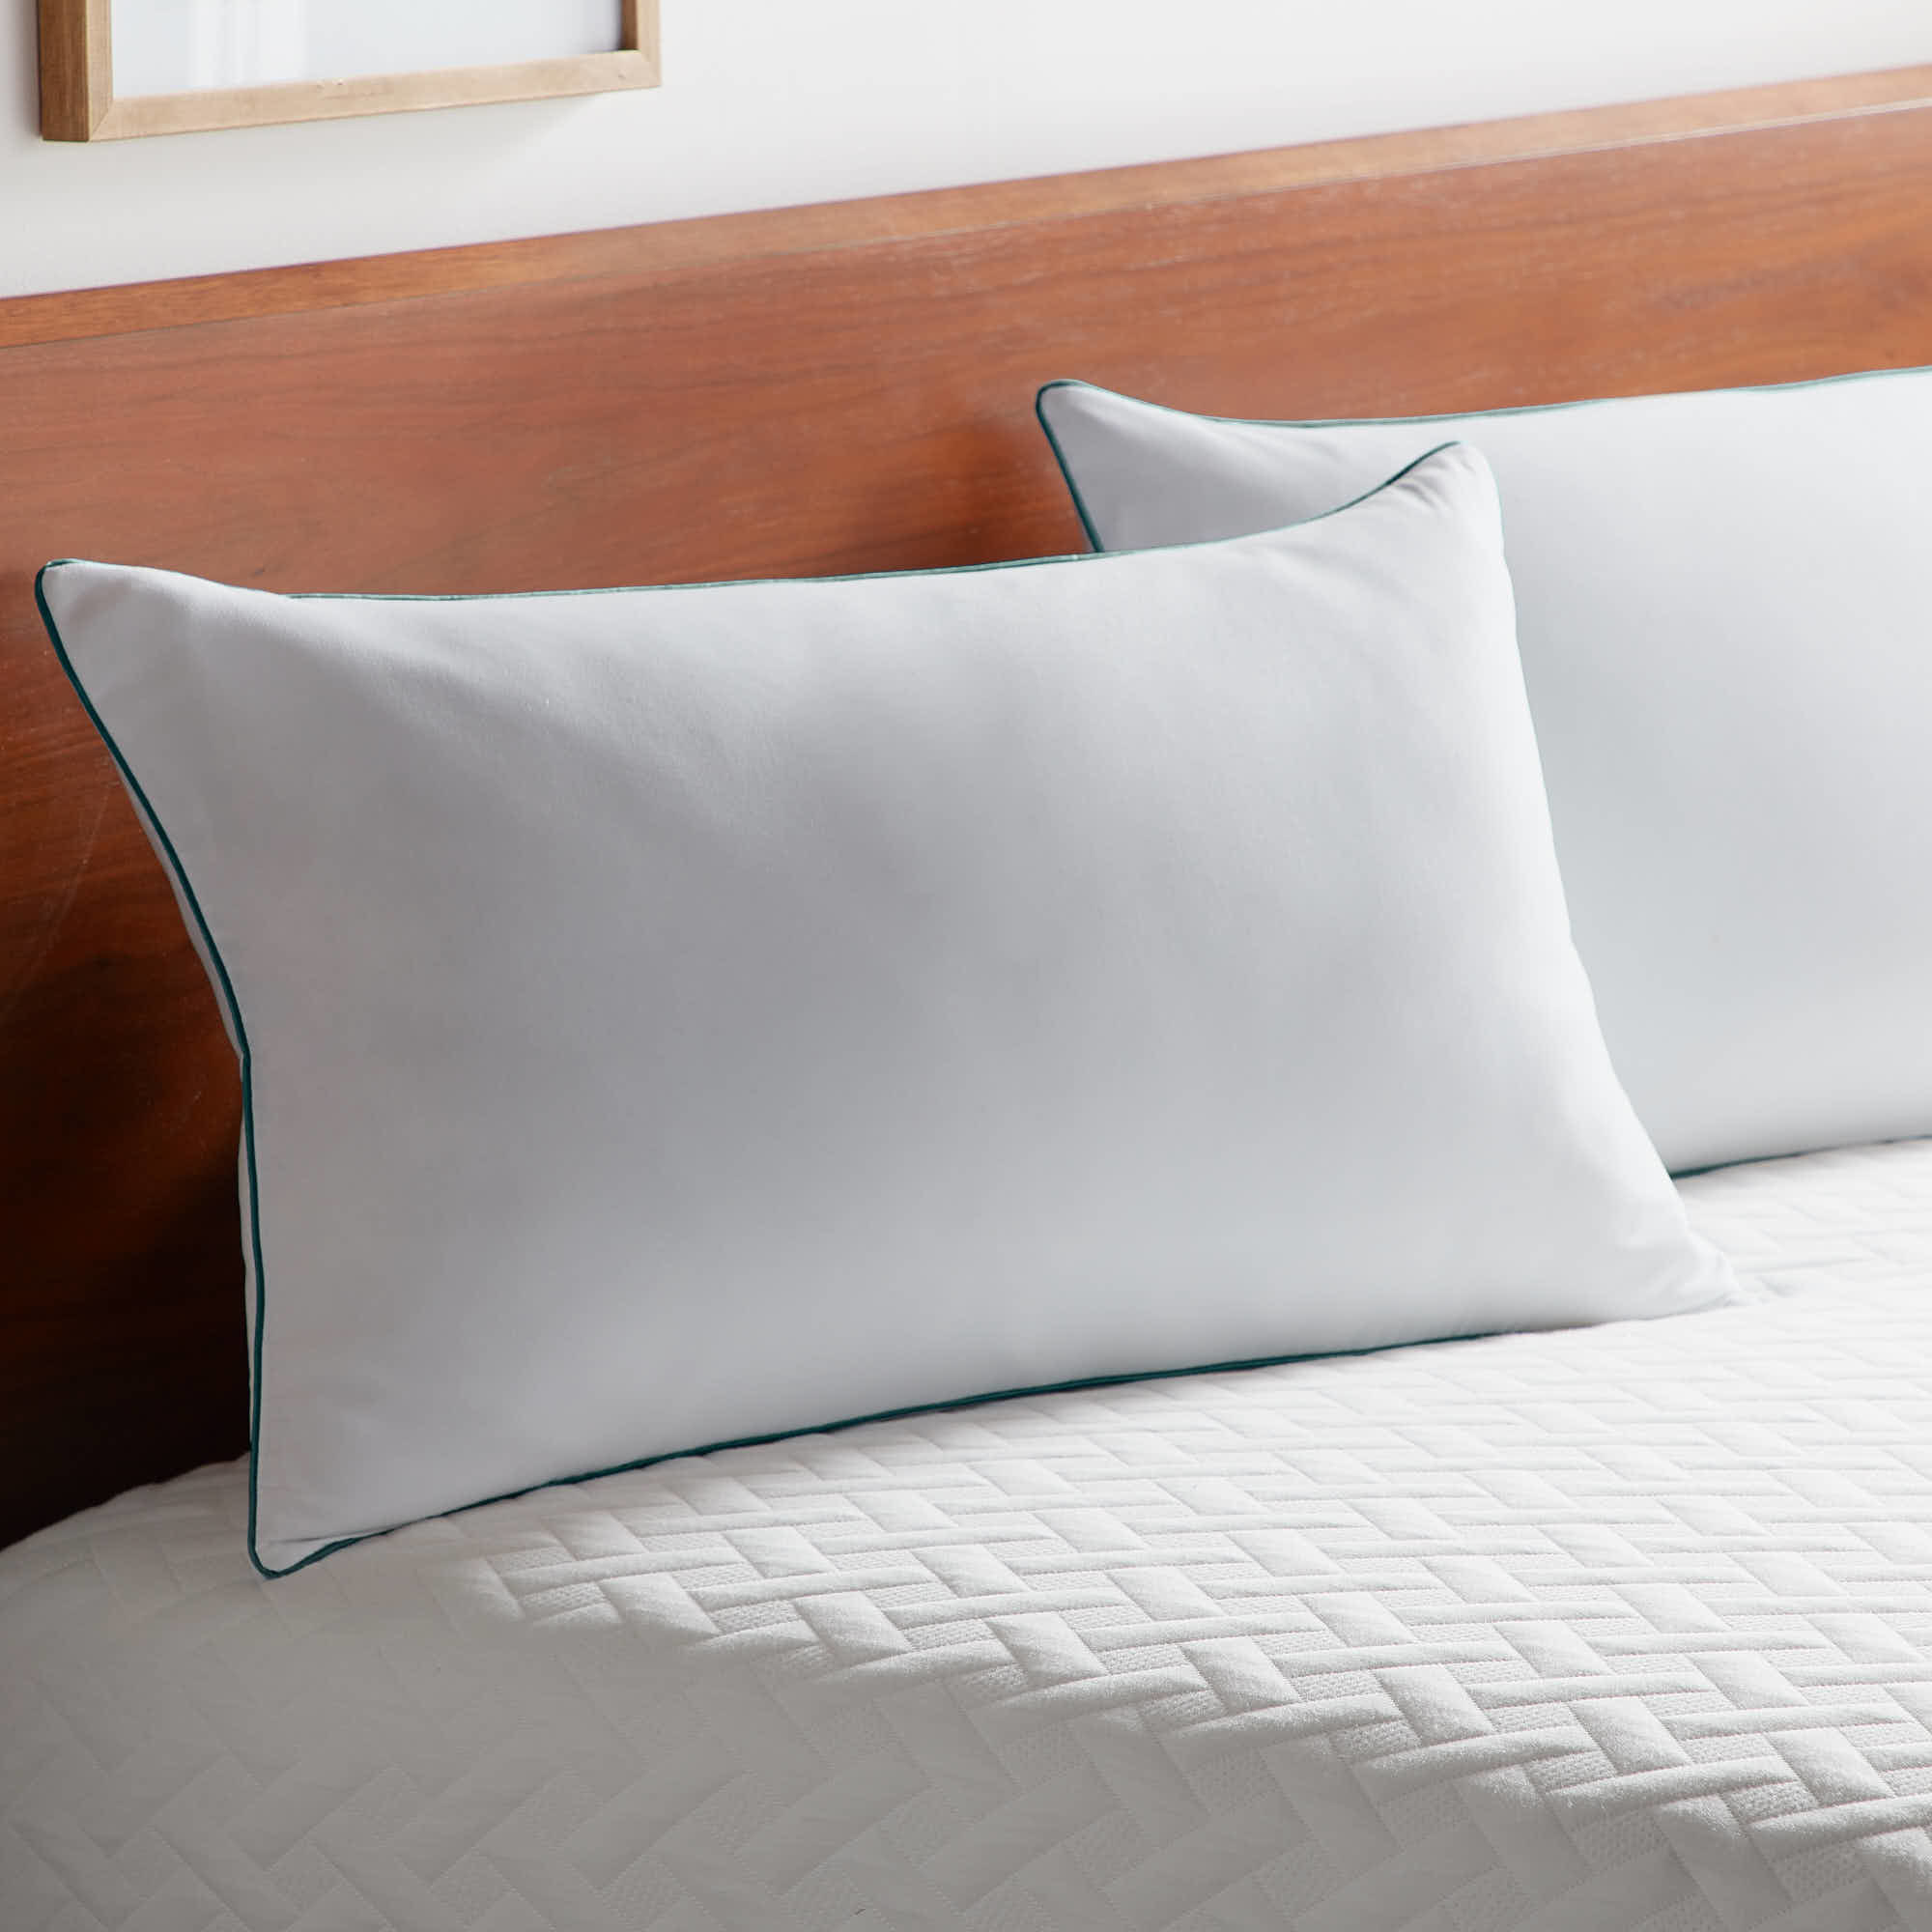 Two memory foam pillows on top of a mattress.